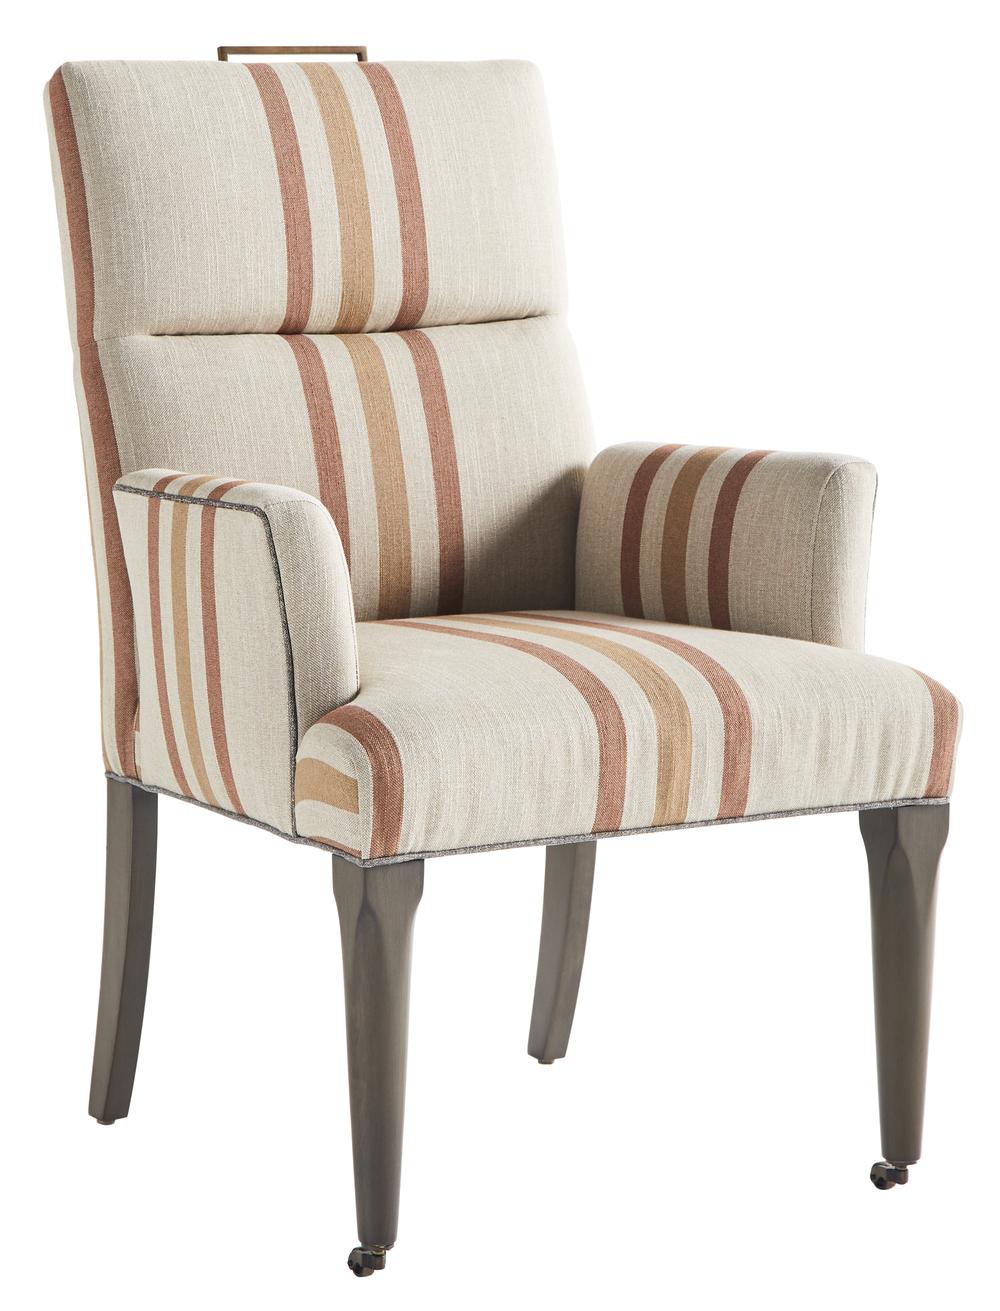 Vanguard Furniture - Brattle Road Arm Chair